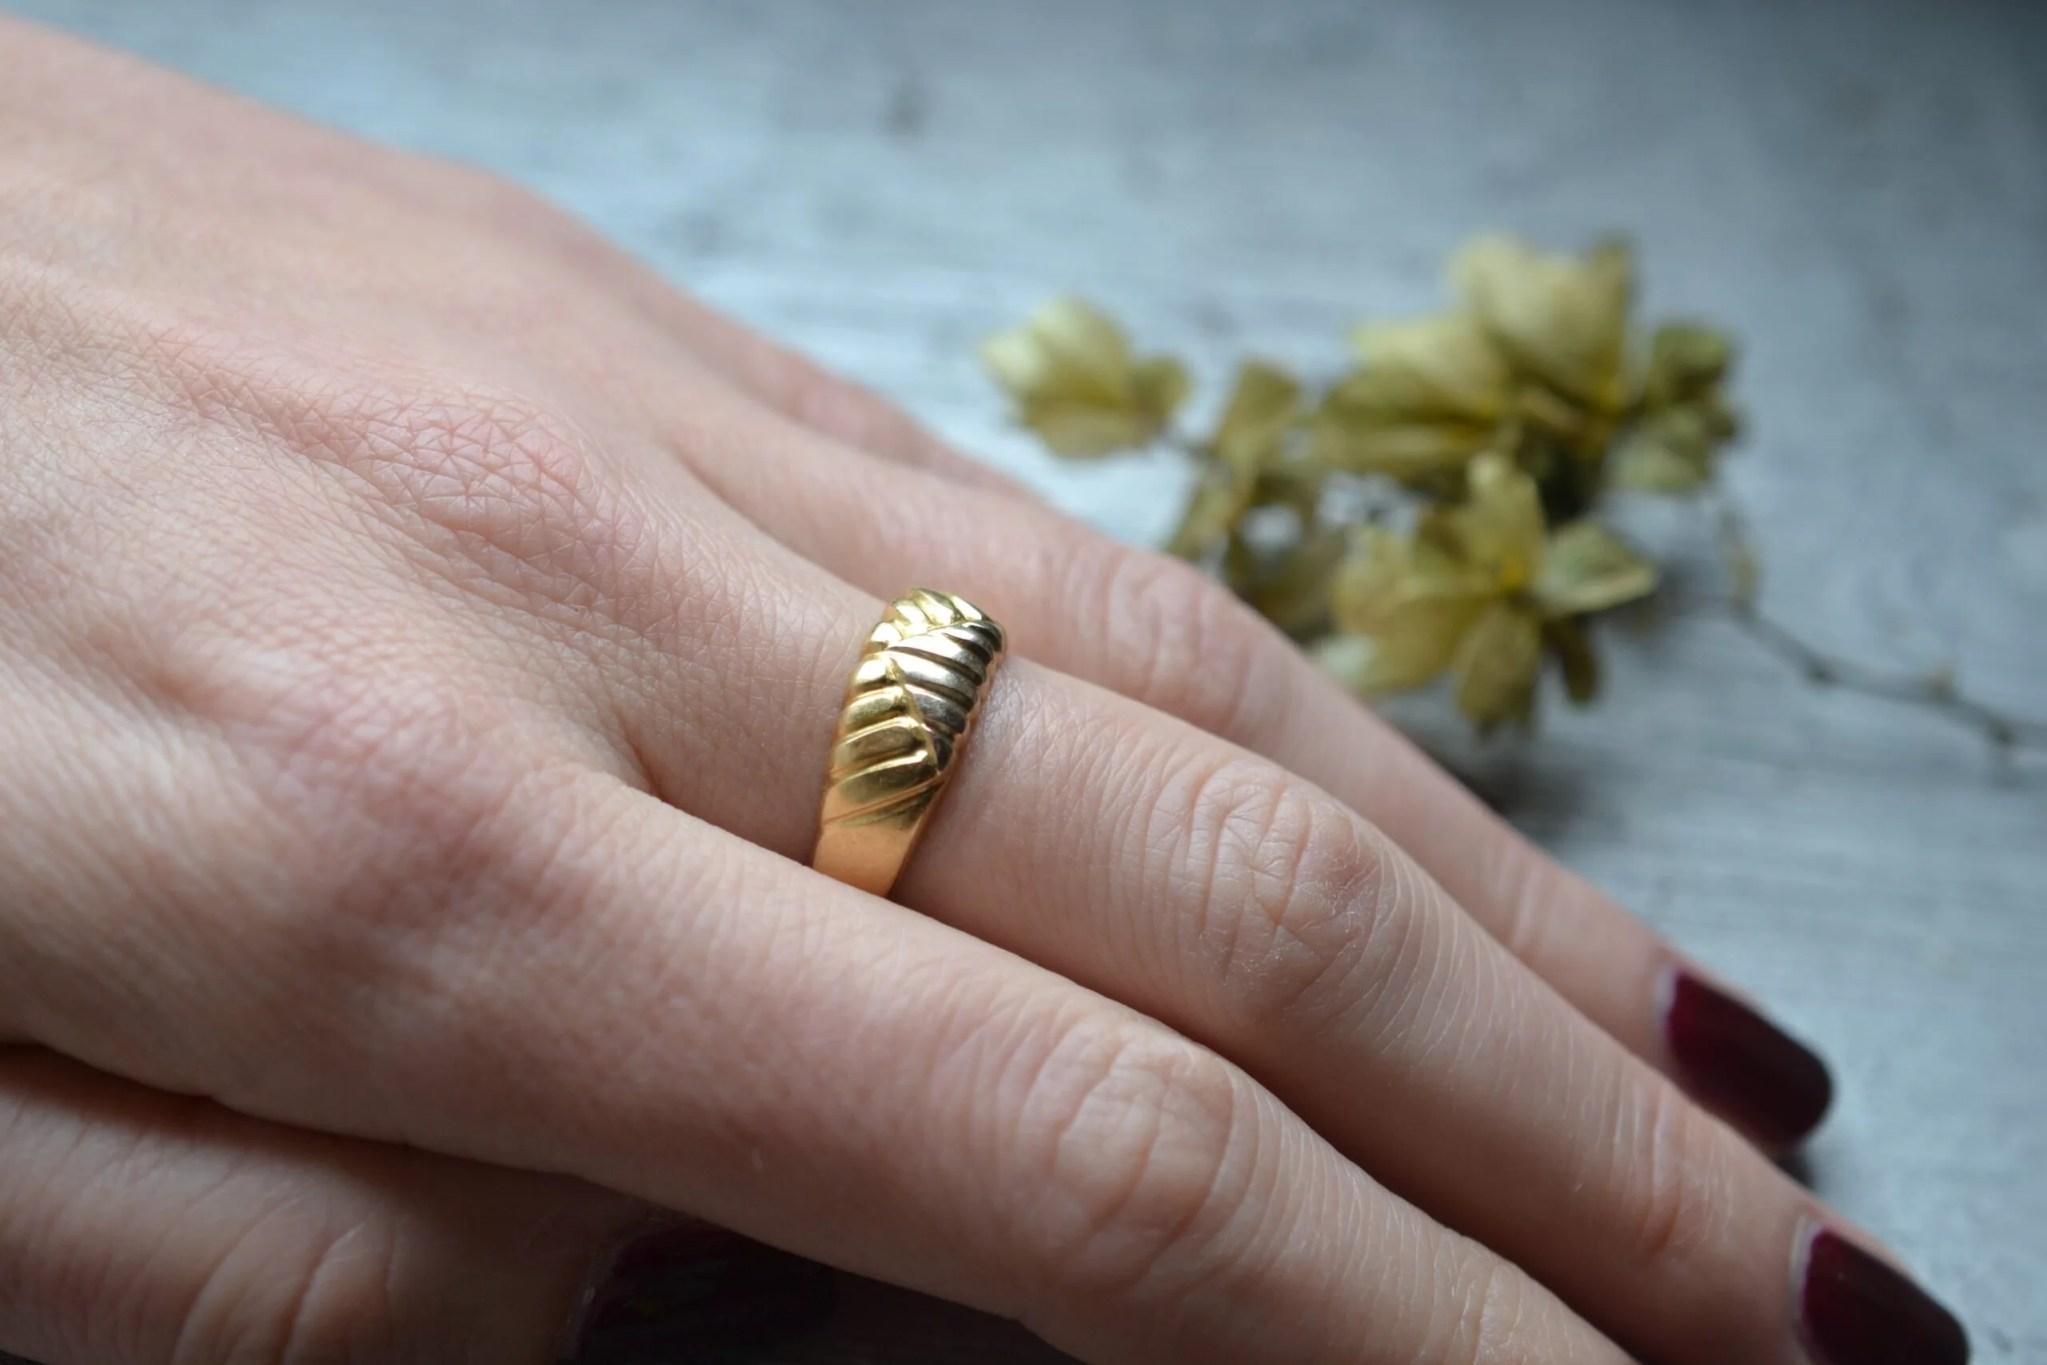 bague ancienne or jaune massif 18 carats bijou vintage motif estampé